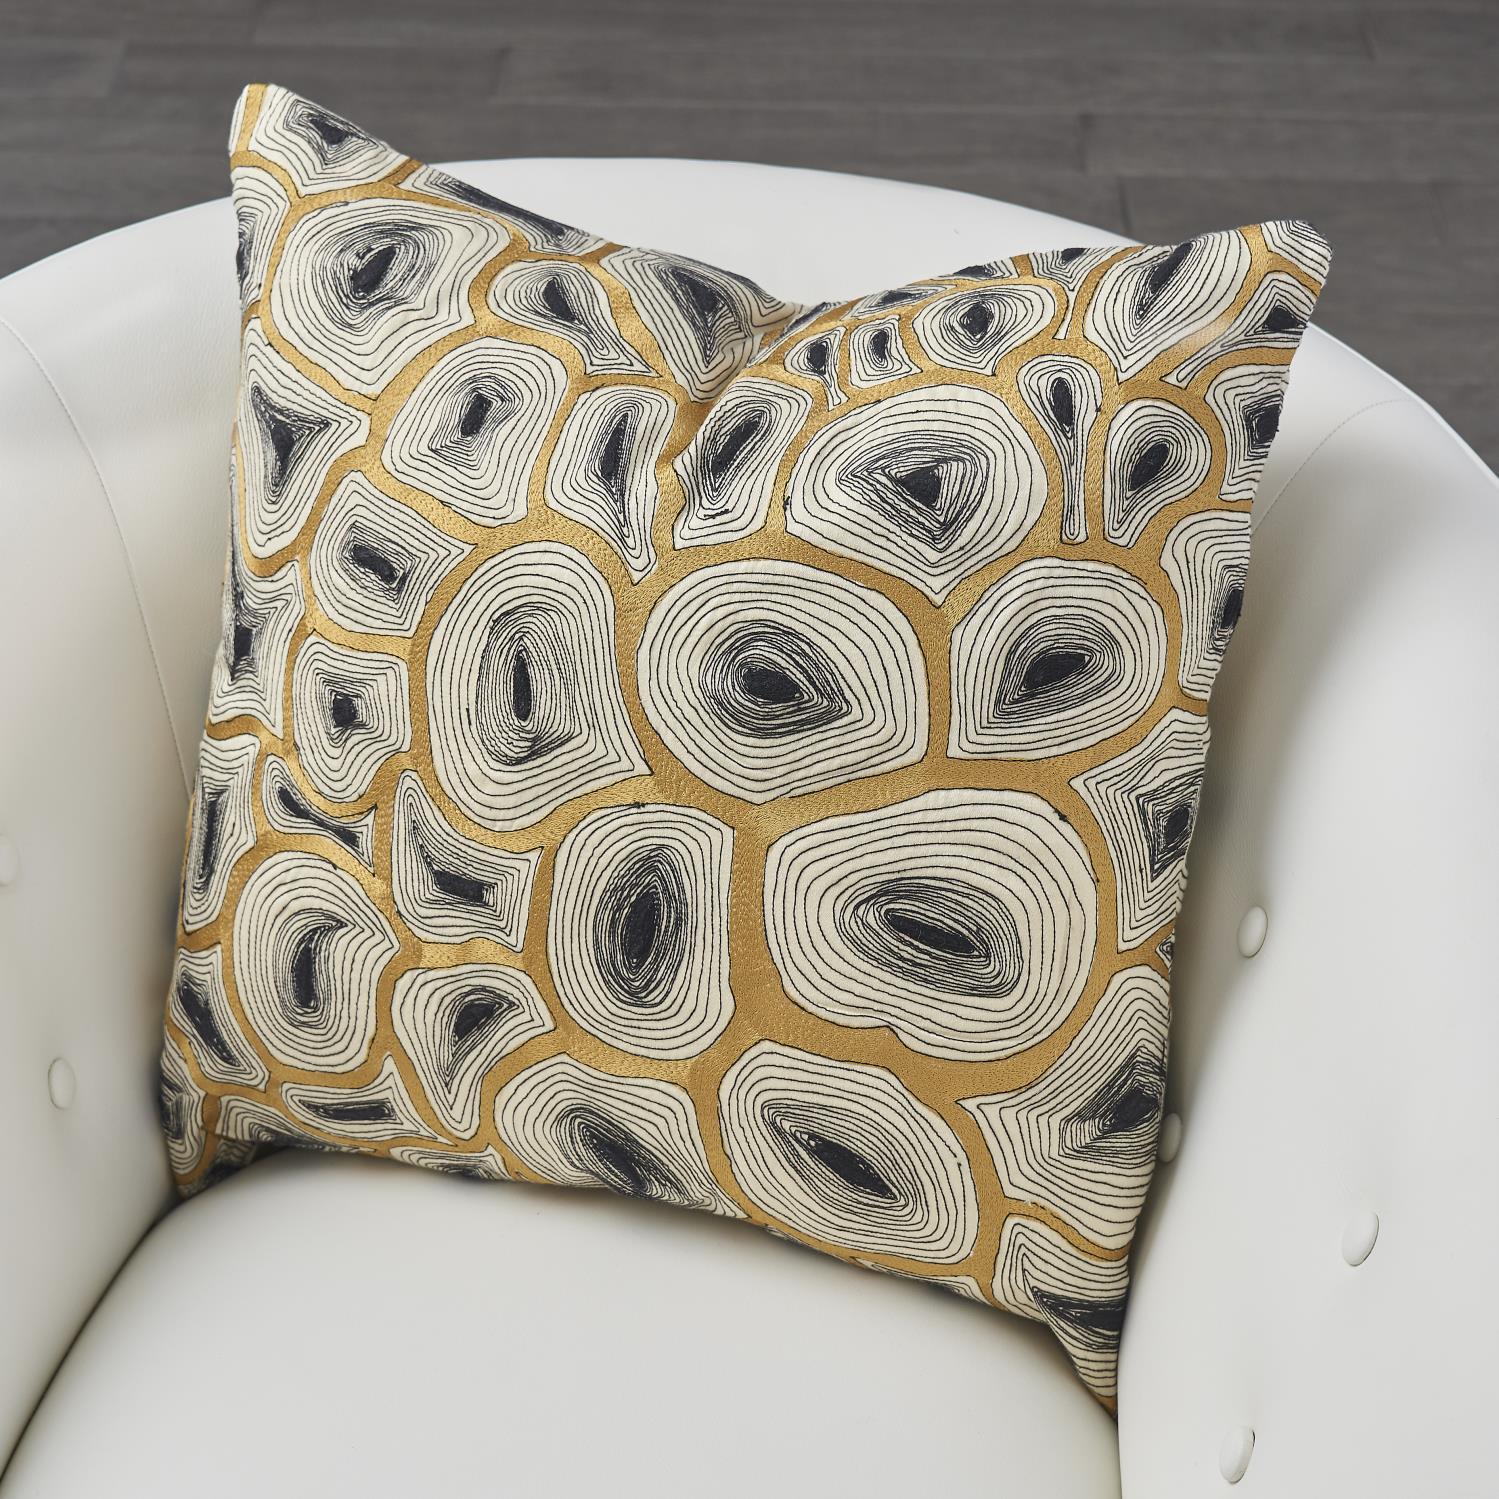 Agate Pillow Black & Gold